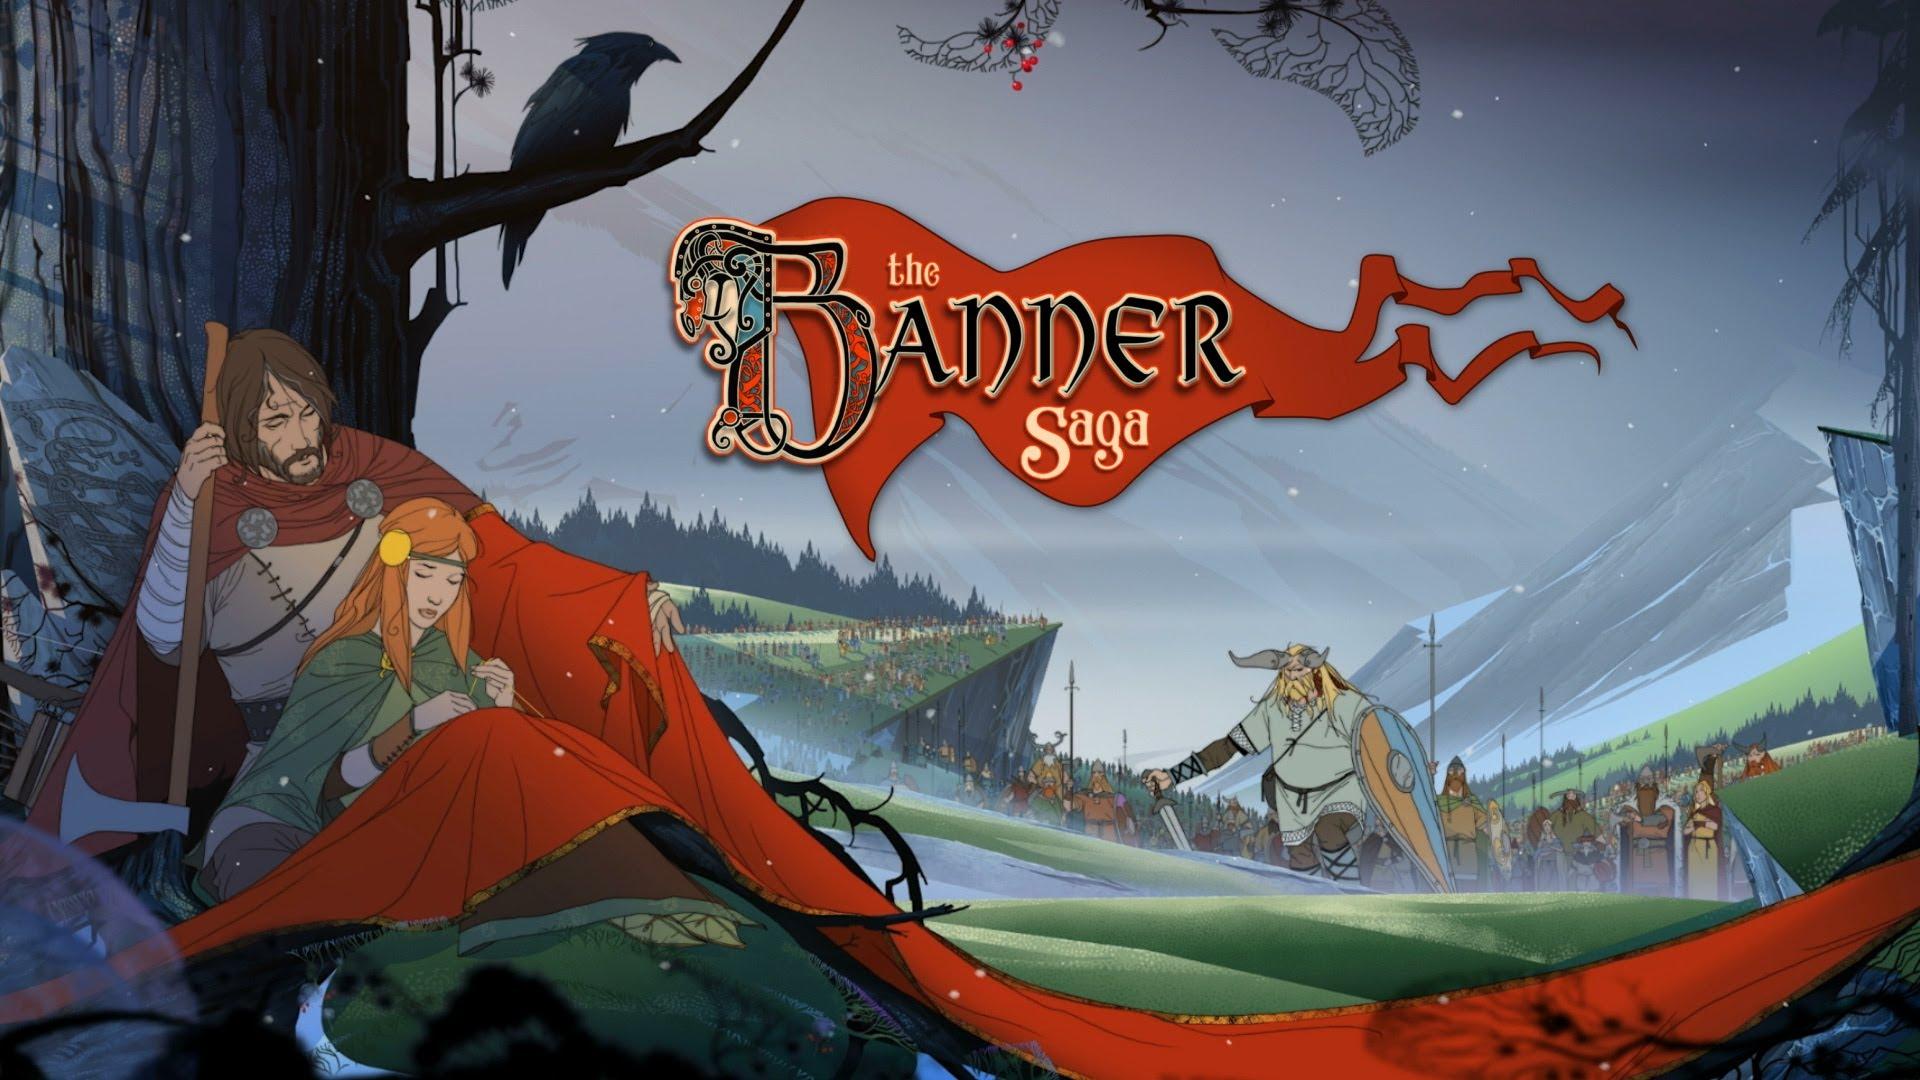 انتشار بازی The Banner of Saga برروی کنسول دستی پیاس ویتا لغو شد